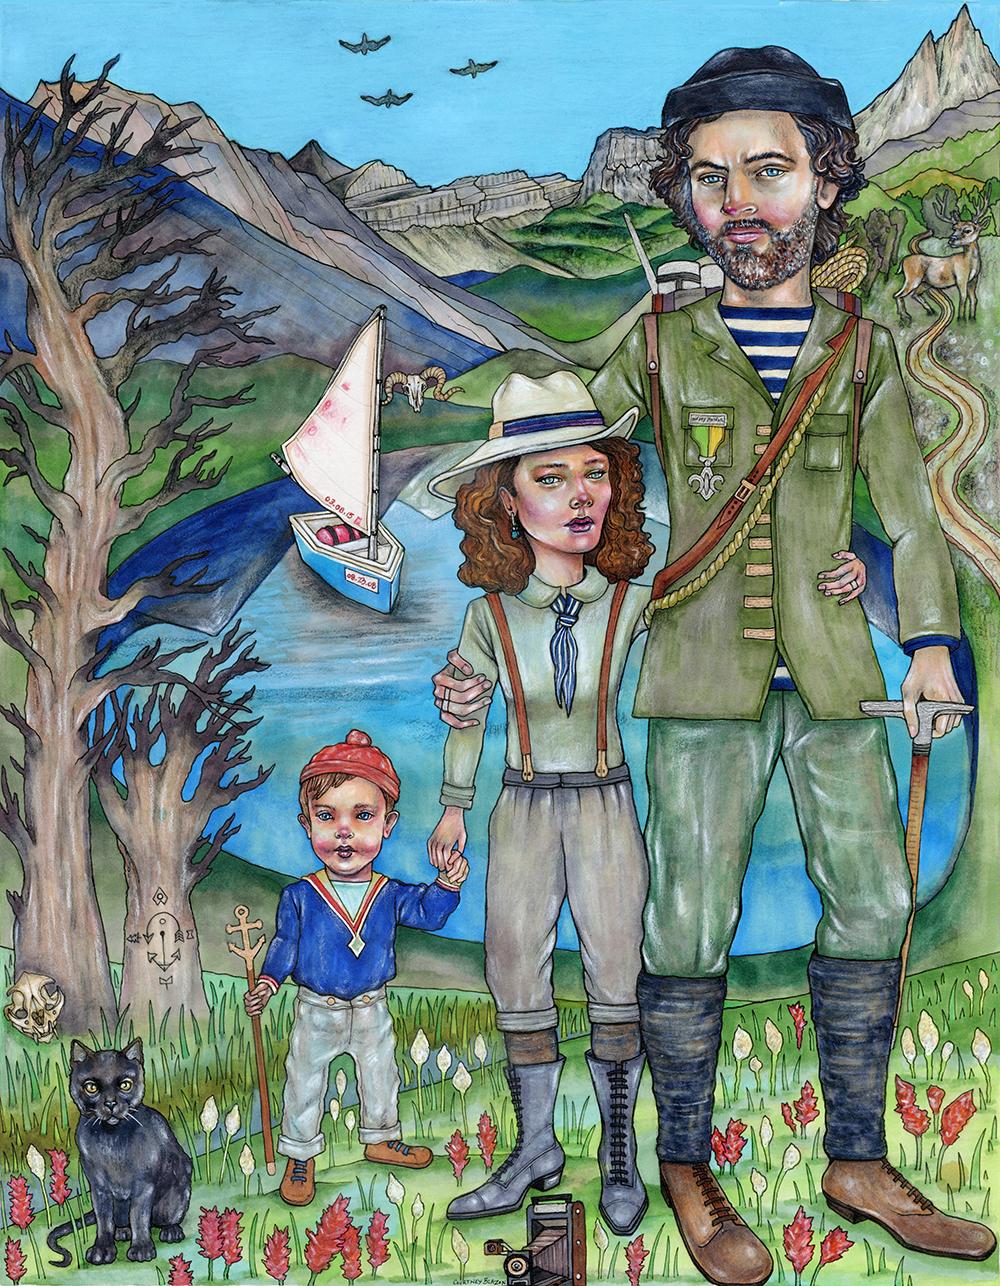 The Sailor Explorers by Courtney Blazon